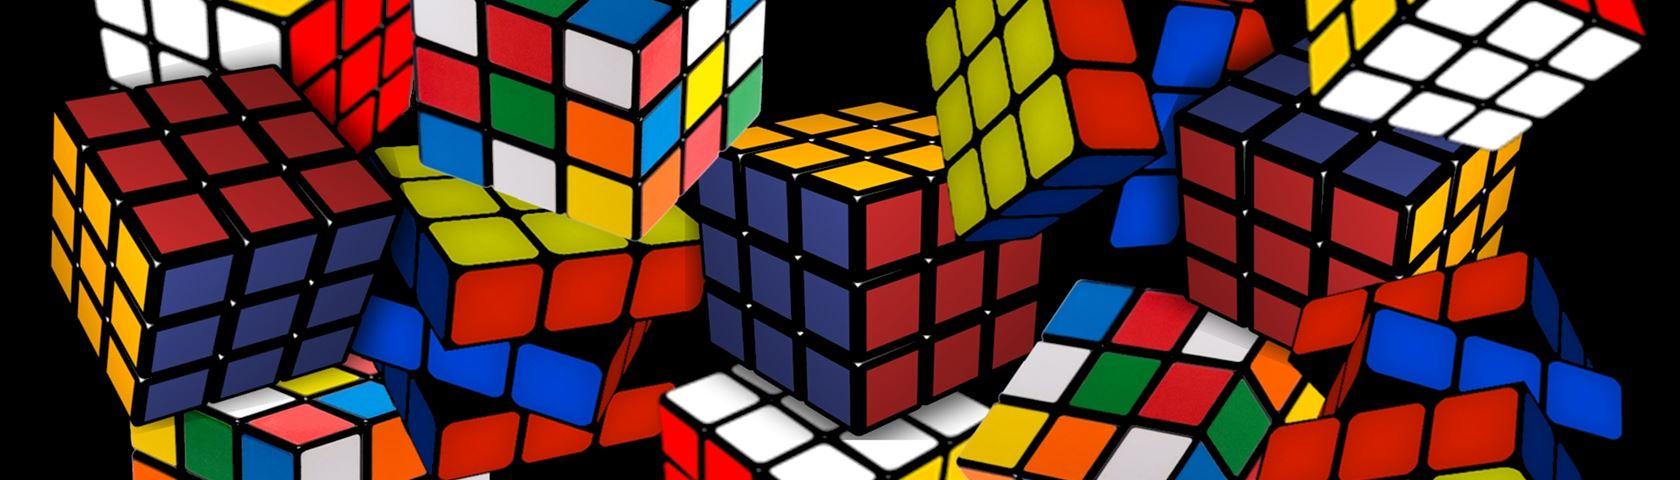 Rubiks Cubiks